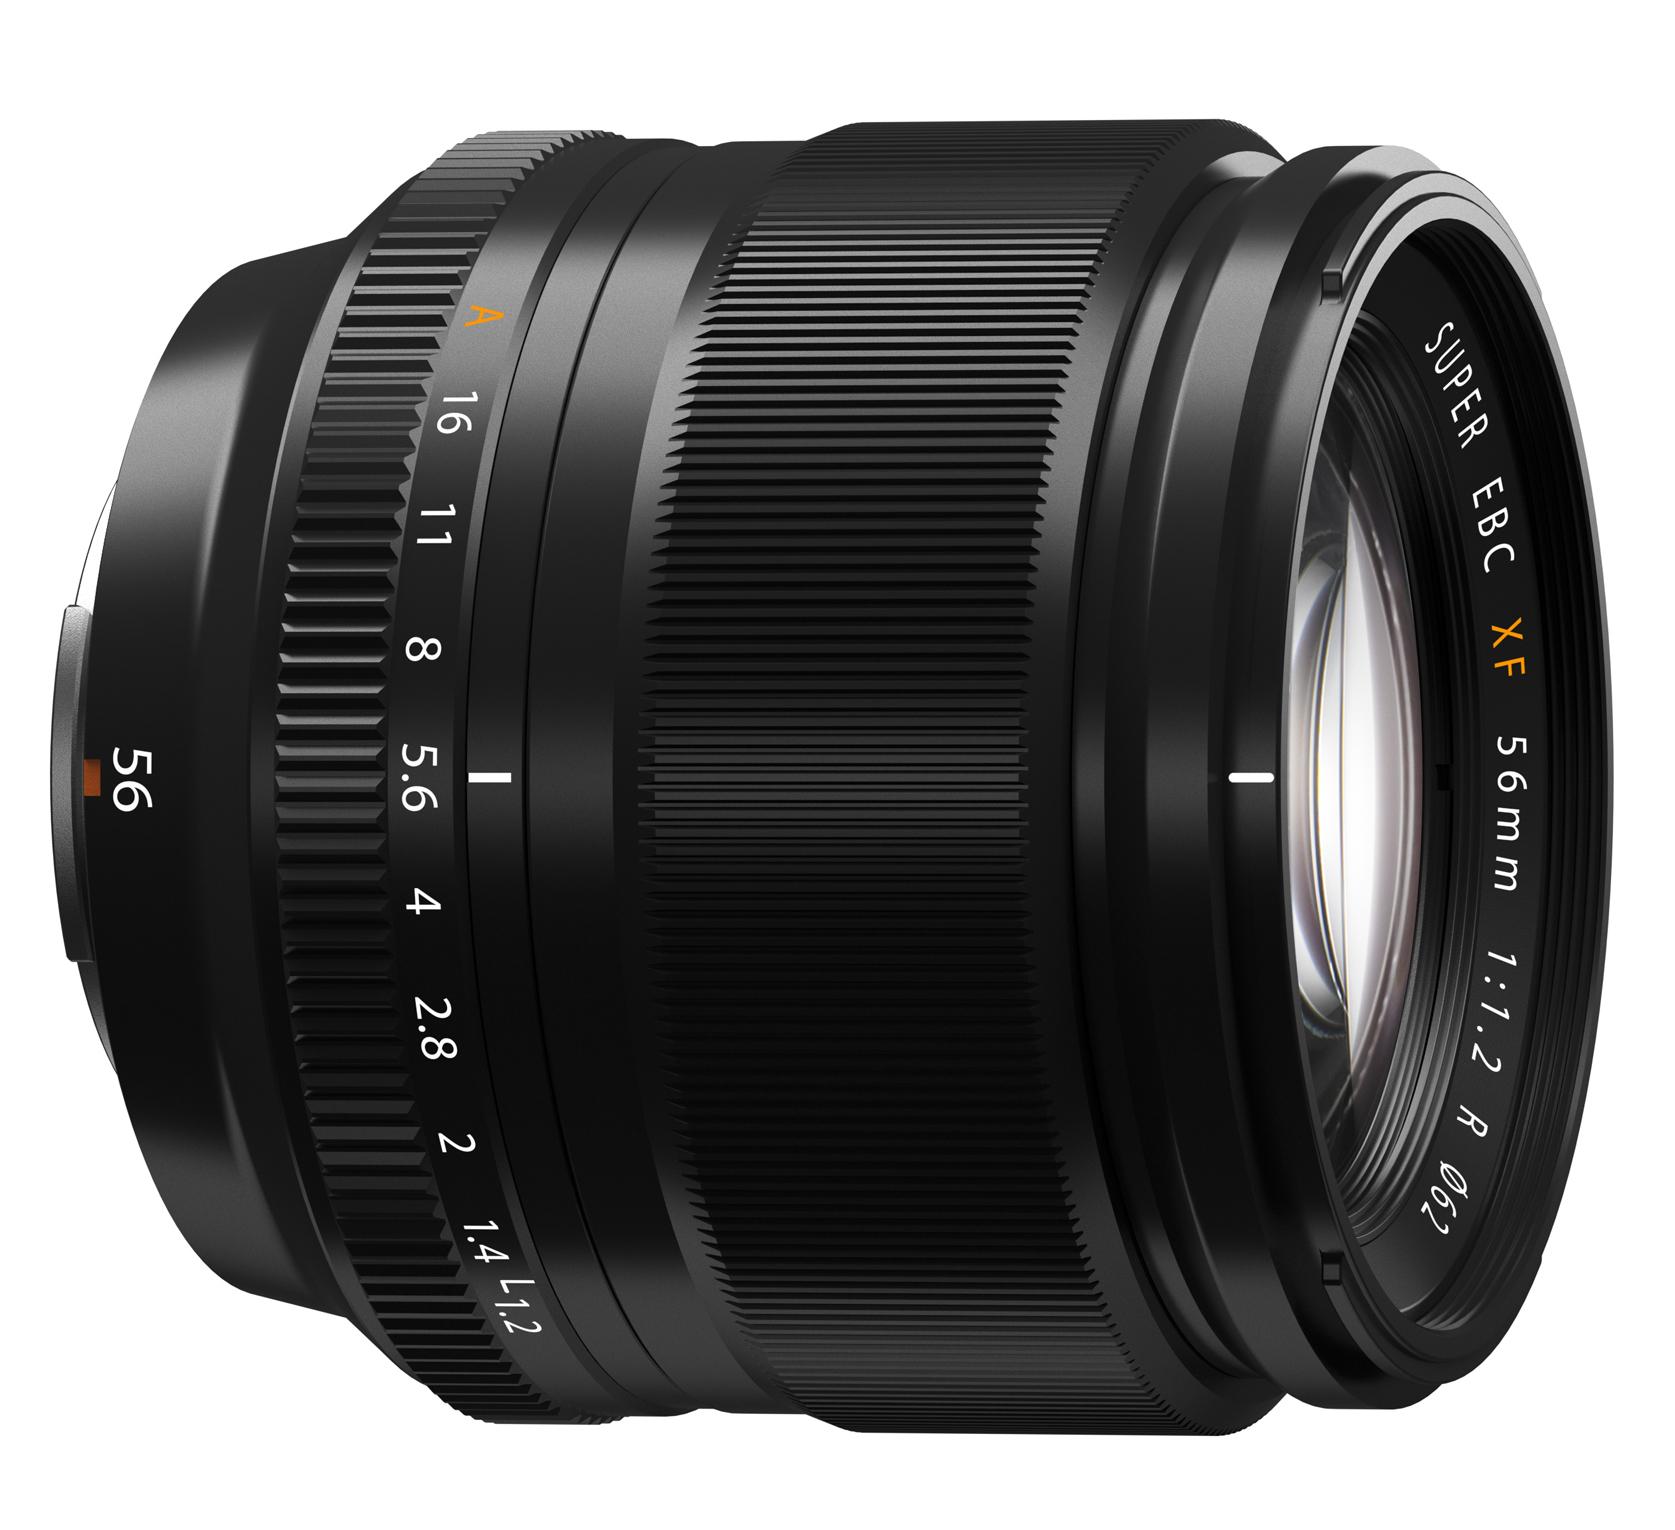 Fuji's Fujinon XF 56mm f/1.2 R Lens: A Review